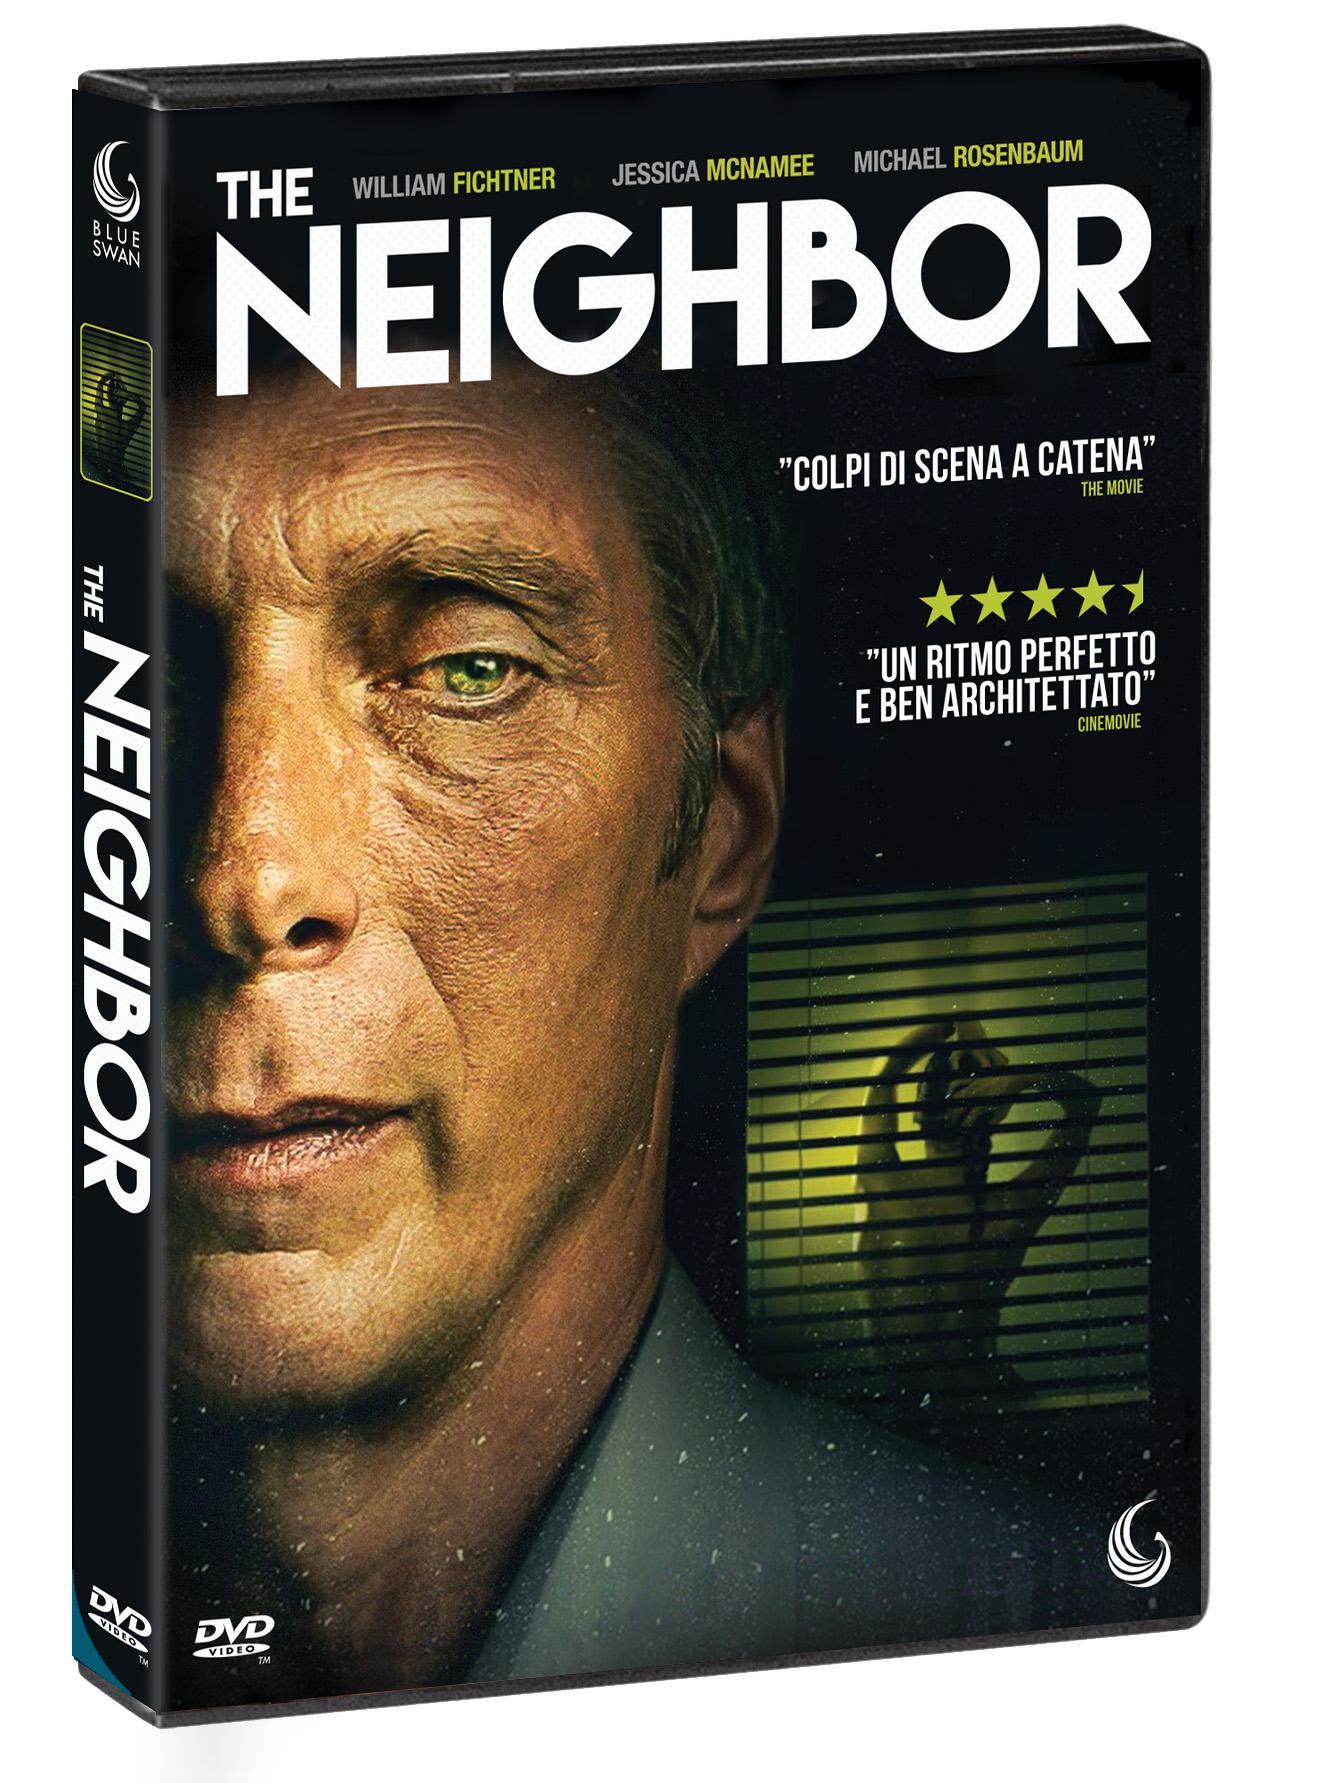 THE NEIGHBOR (DVD)